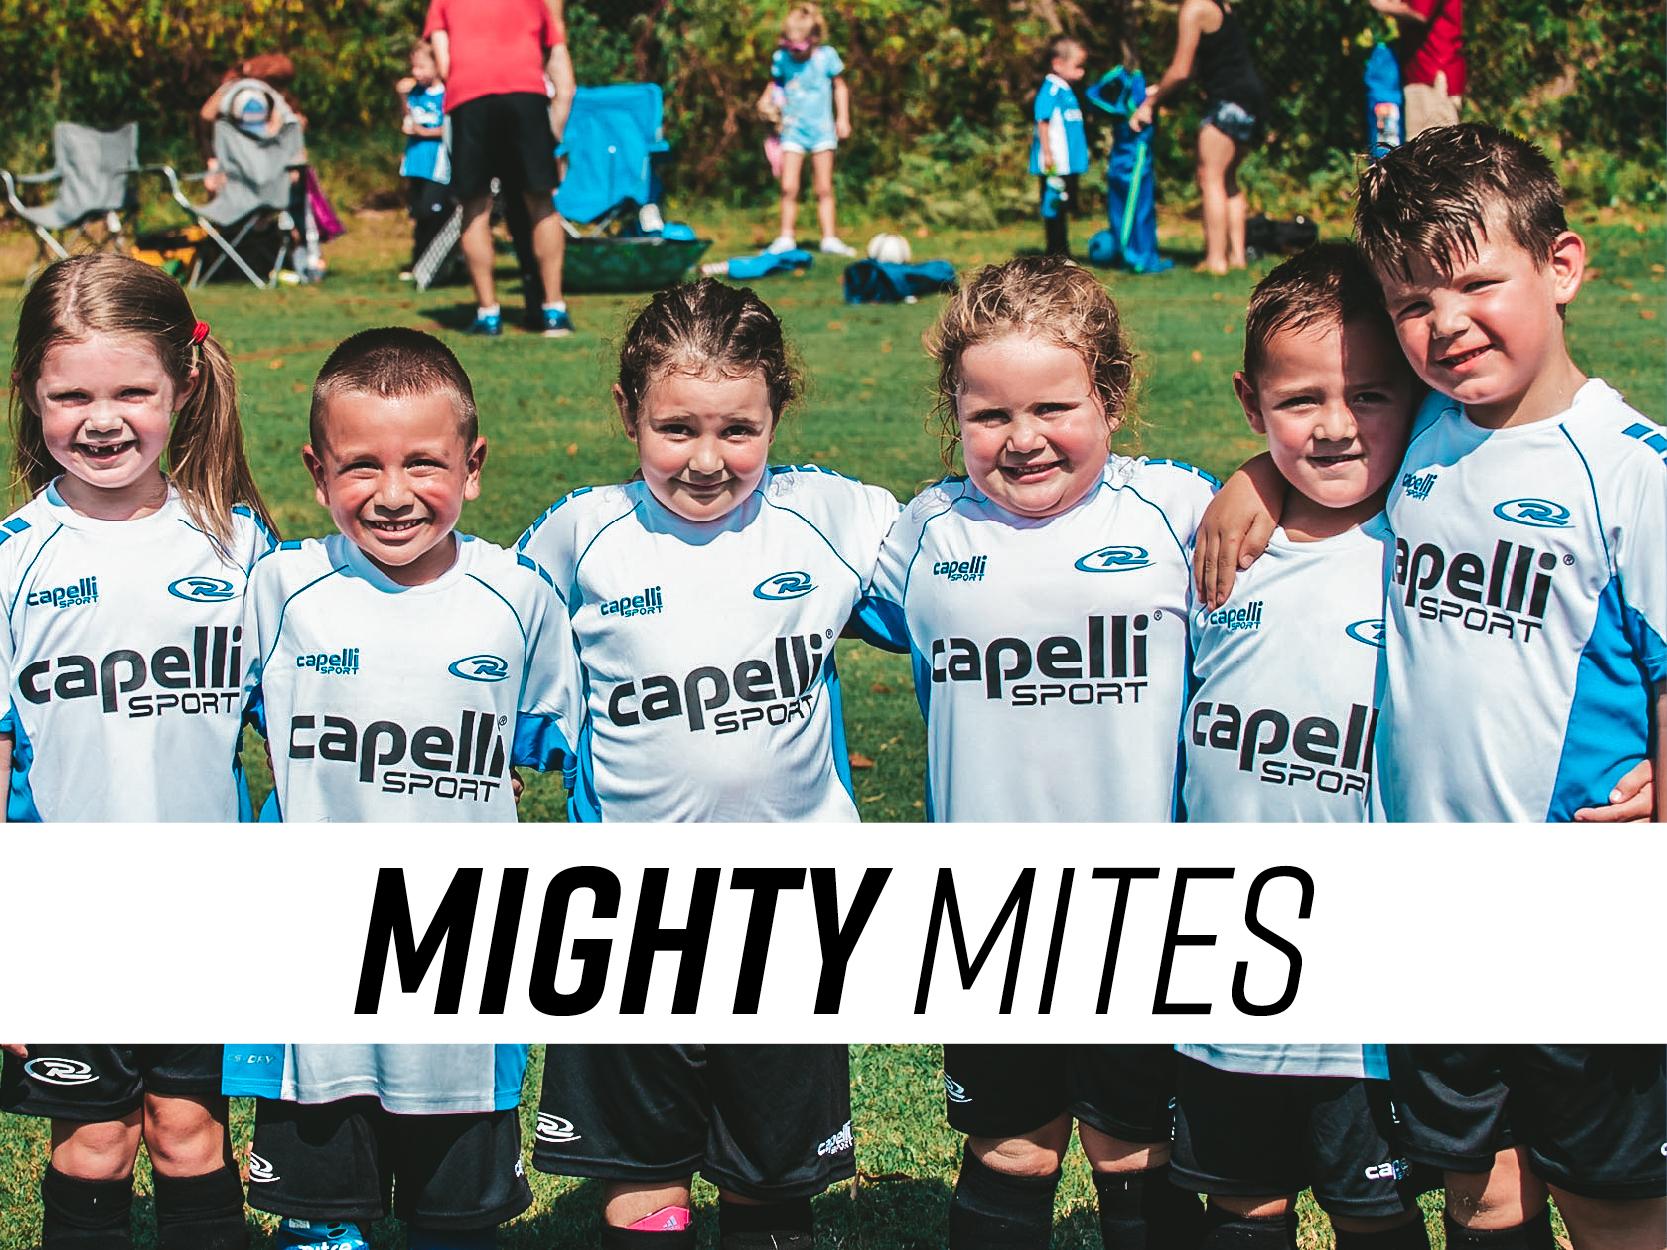 Mighty Mites4 (1)